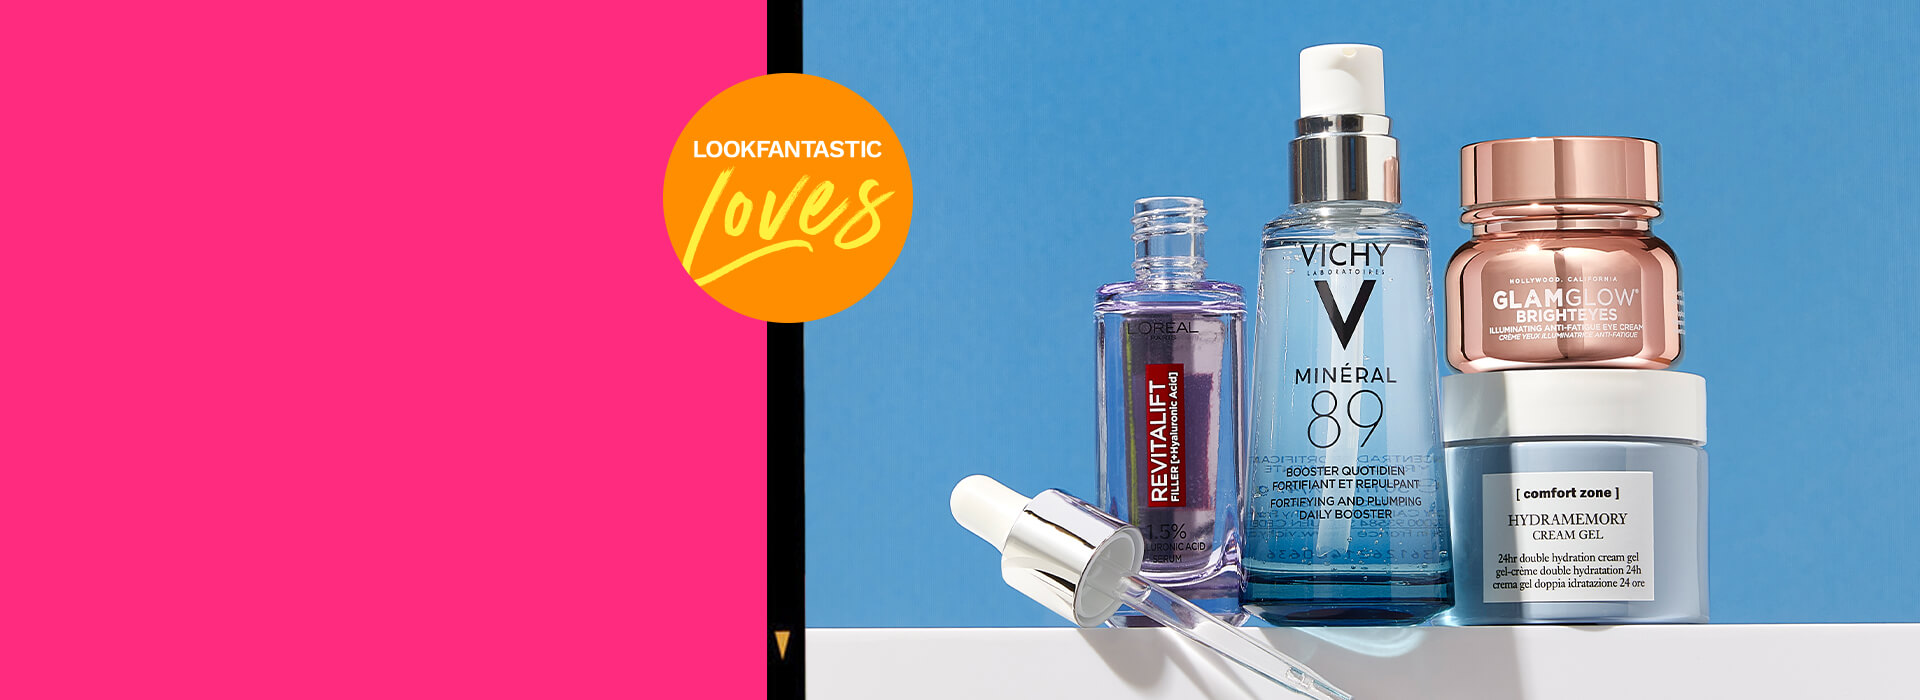 ingredient focus - hyaluronic acid. shop now